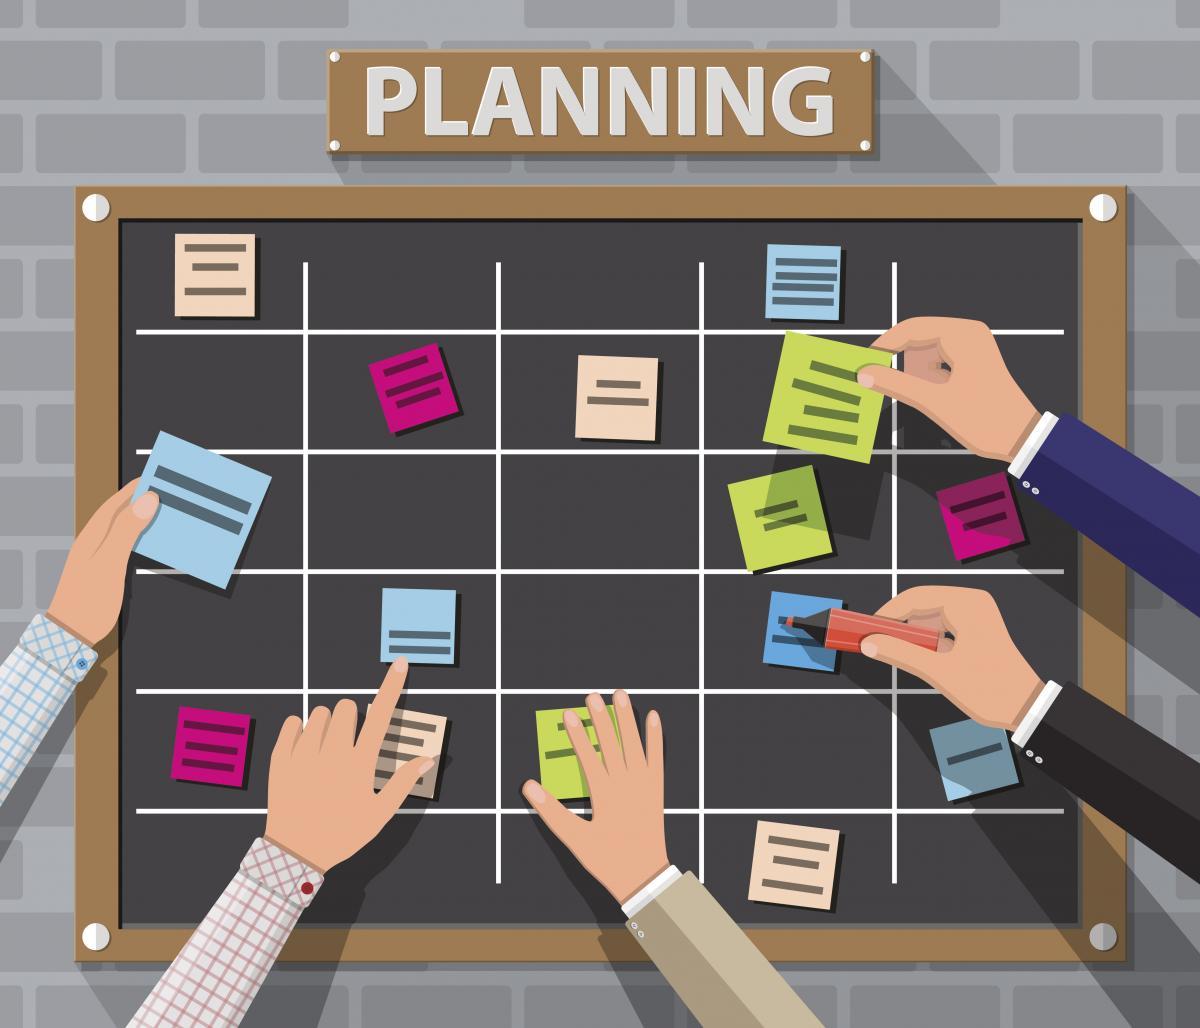 bulletin board for planning priorities